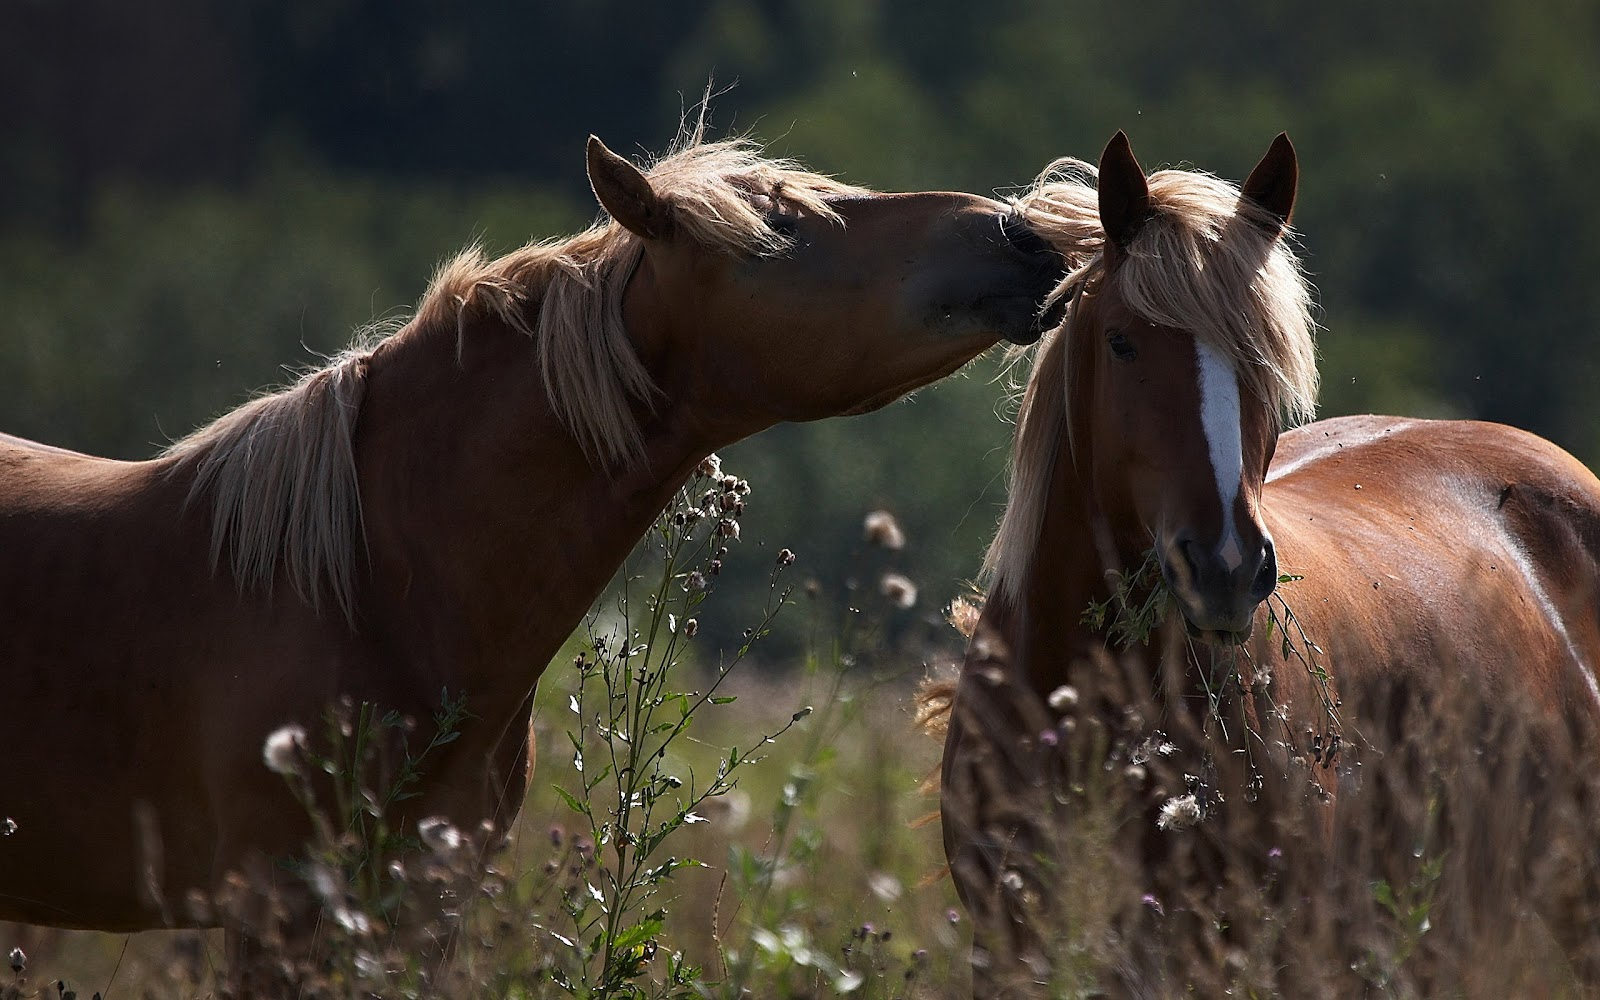 http://2.bp.blogspot.com/-ITkZVFtgKao/UCJNlpH8jWI/AAAAAAAAAE0/w8PTXU9VUC8/s1600/horse-wallpaper-with-two-horses-cudling.jpg